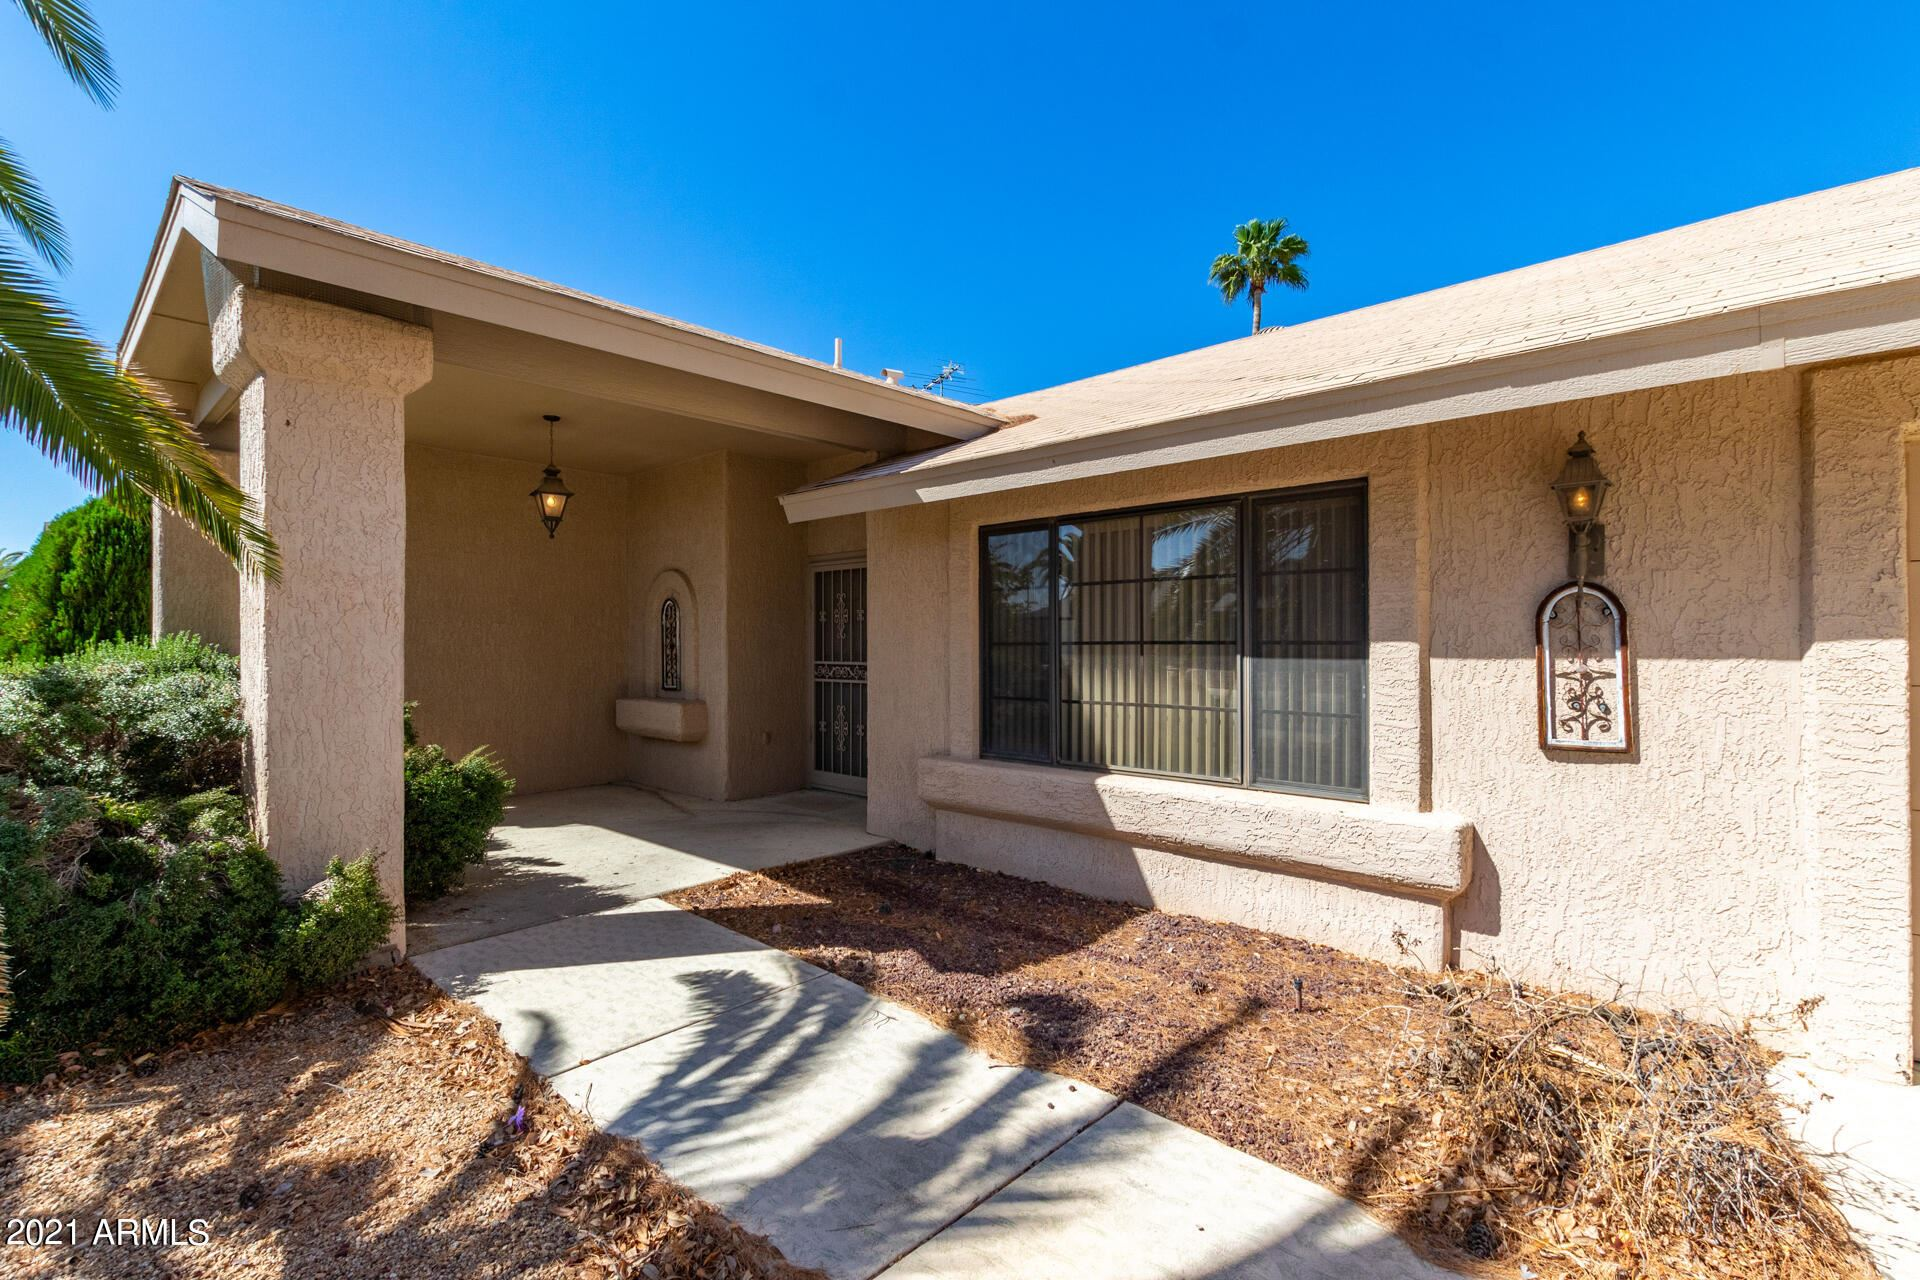 Photo of 14418 W YOSEMITE Drive, Sun City West, AZ 85375 (MLS # 6231075)